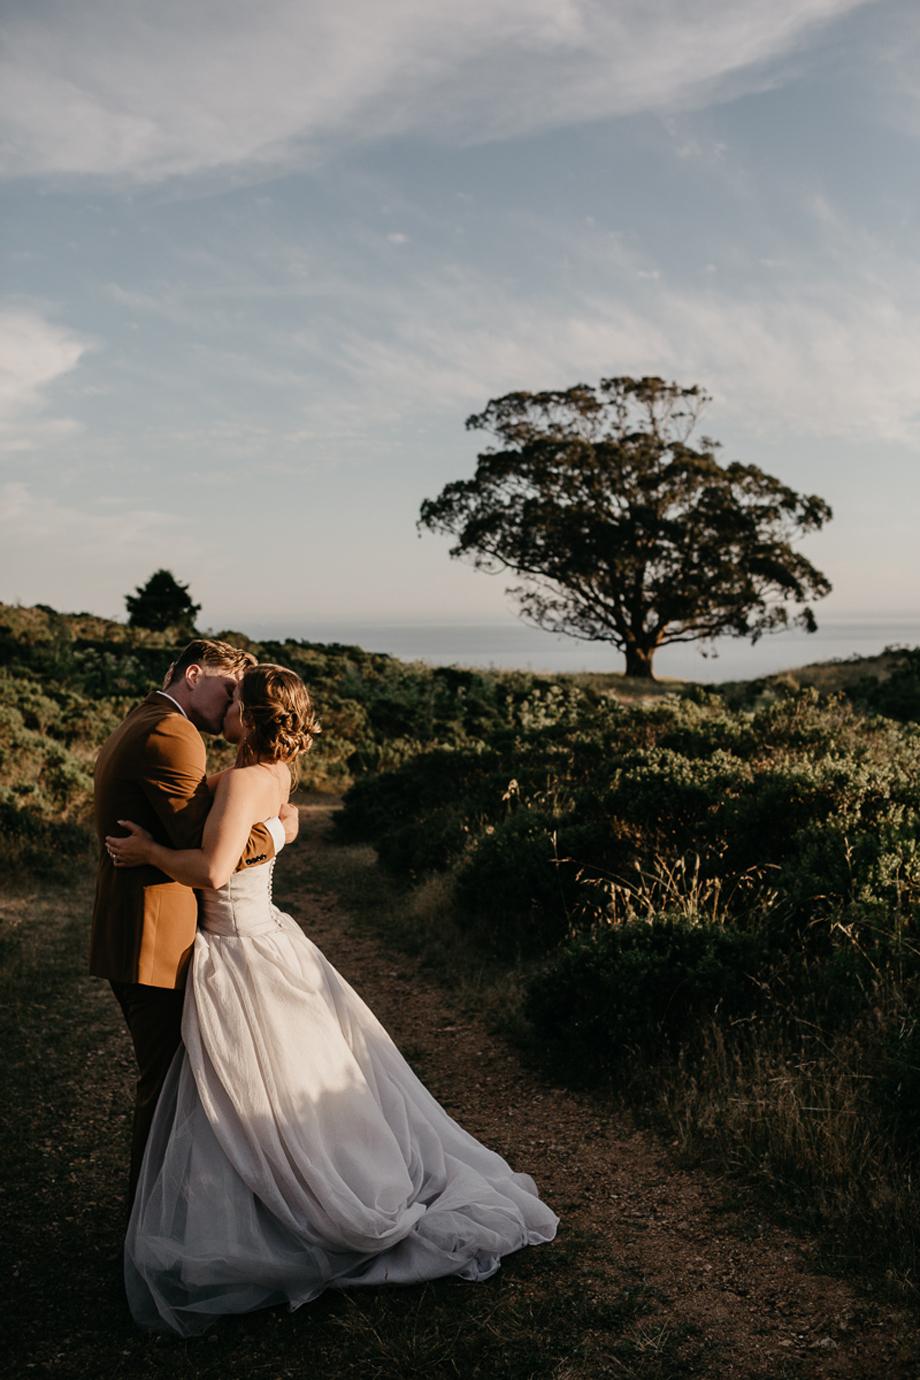 834-destination-wedding-photographer-san-francisco-california--the-livelys.jpg